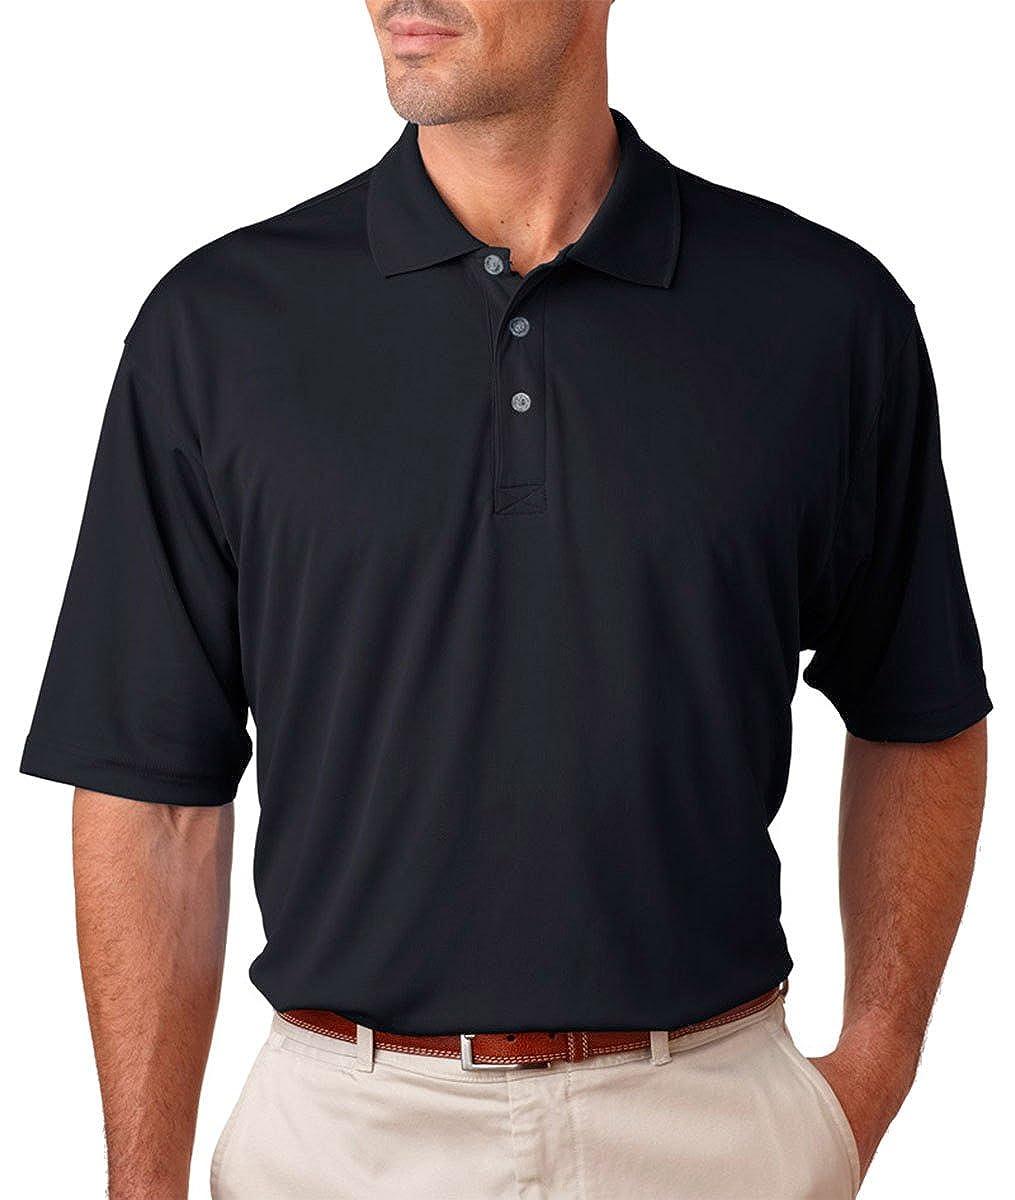 online shopping WANGSHUIJUN Women Seamless Sport Shirt